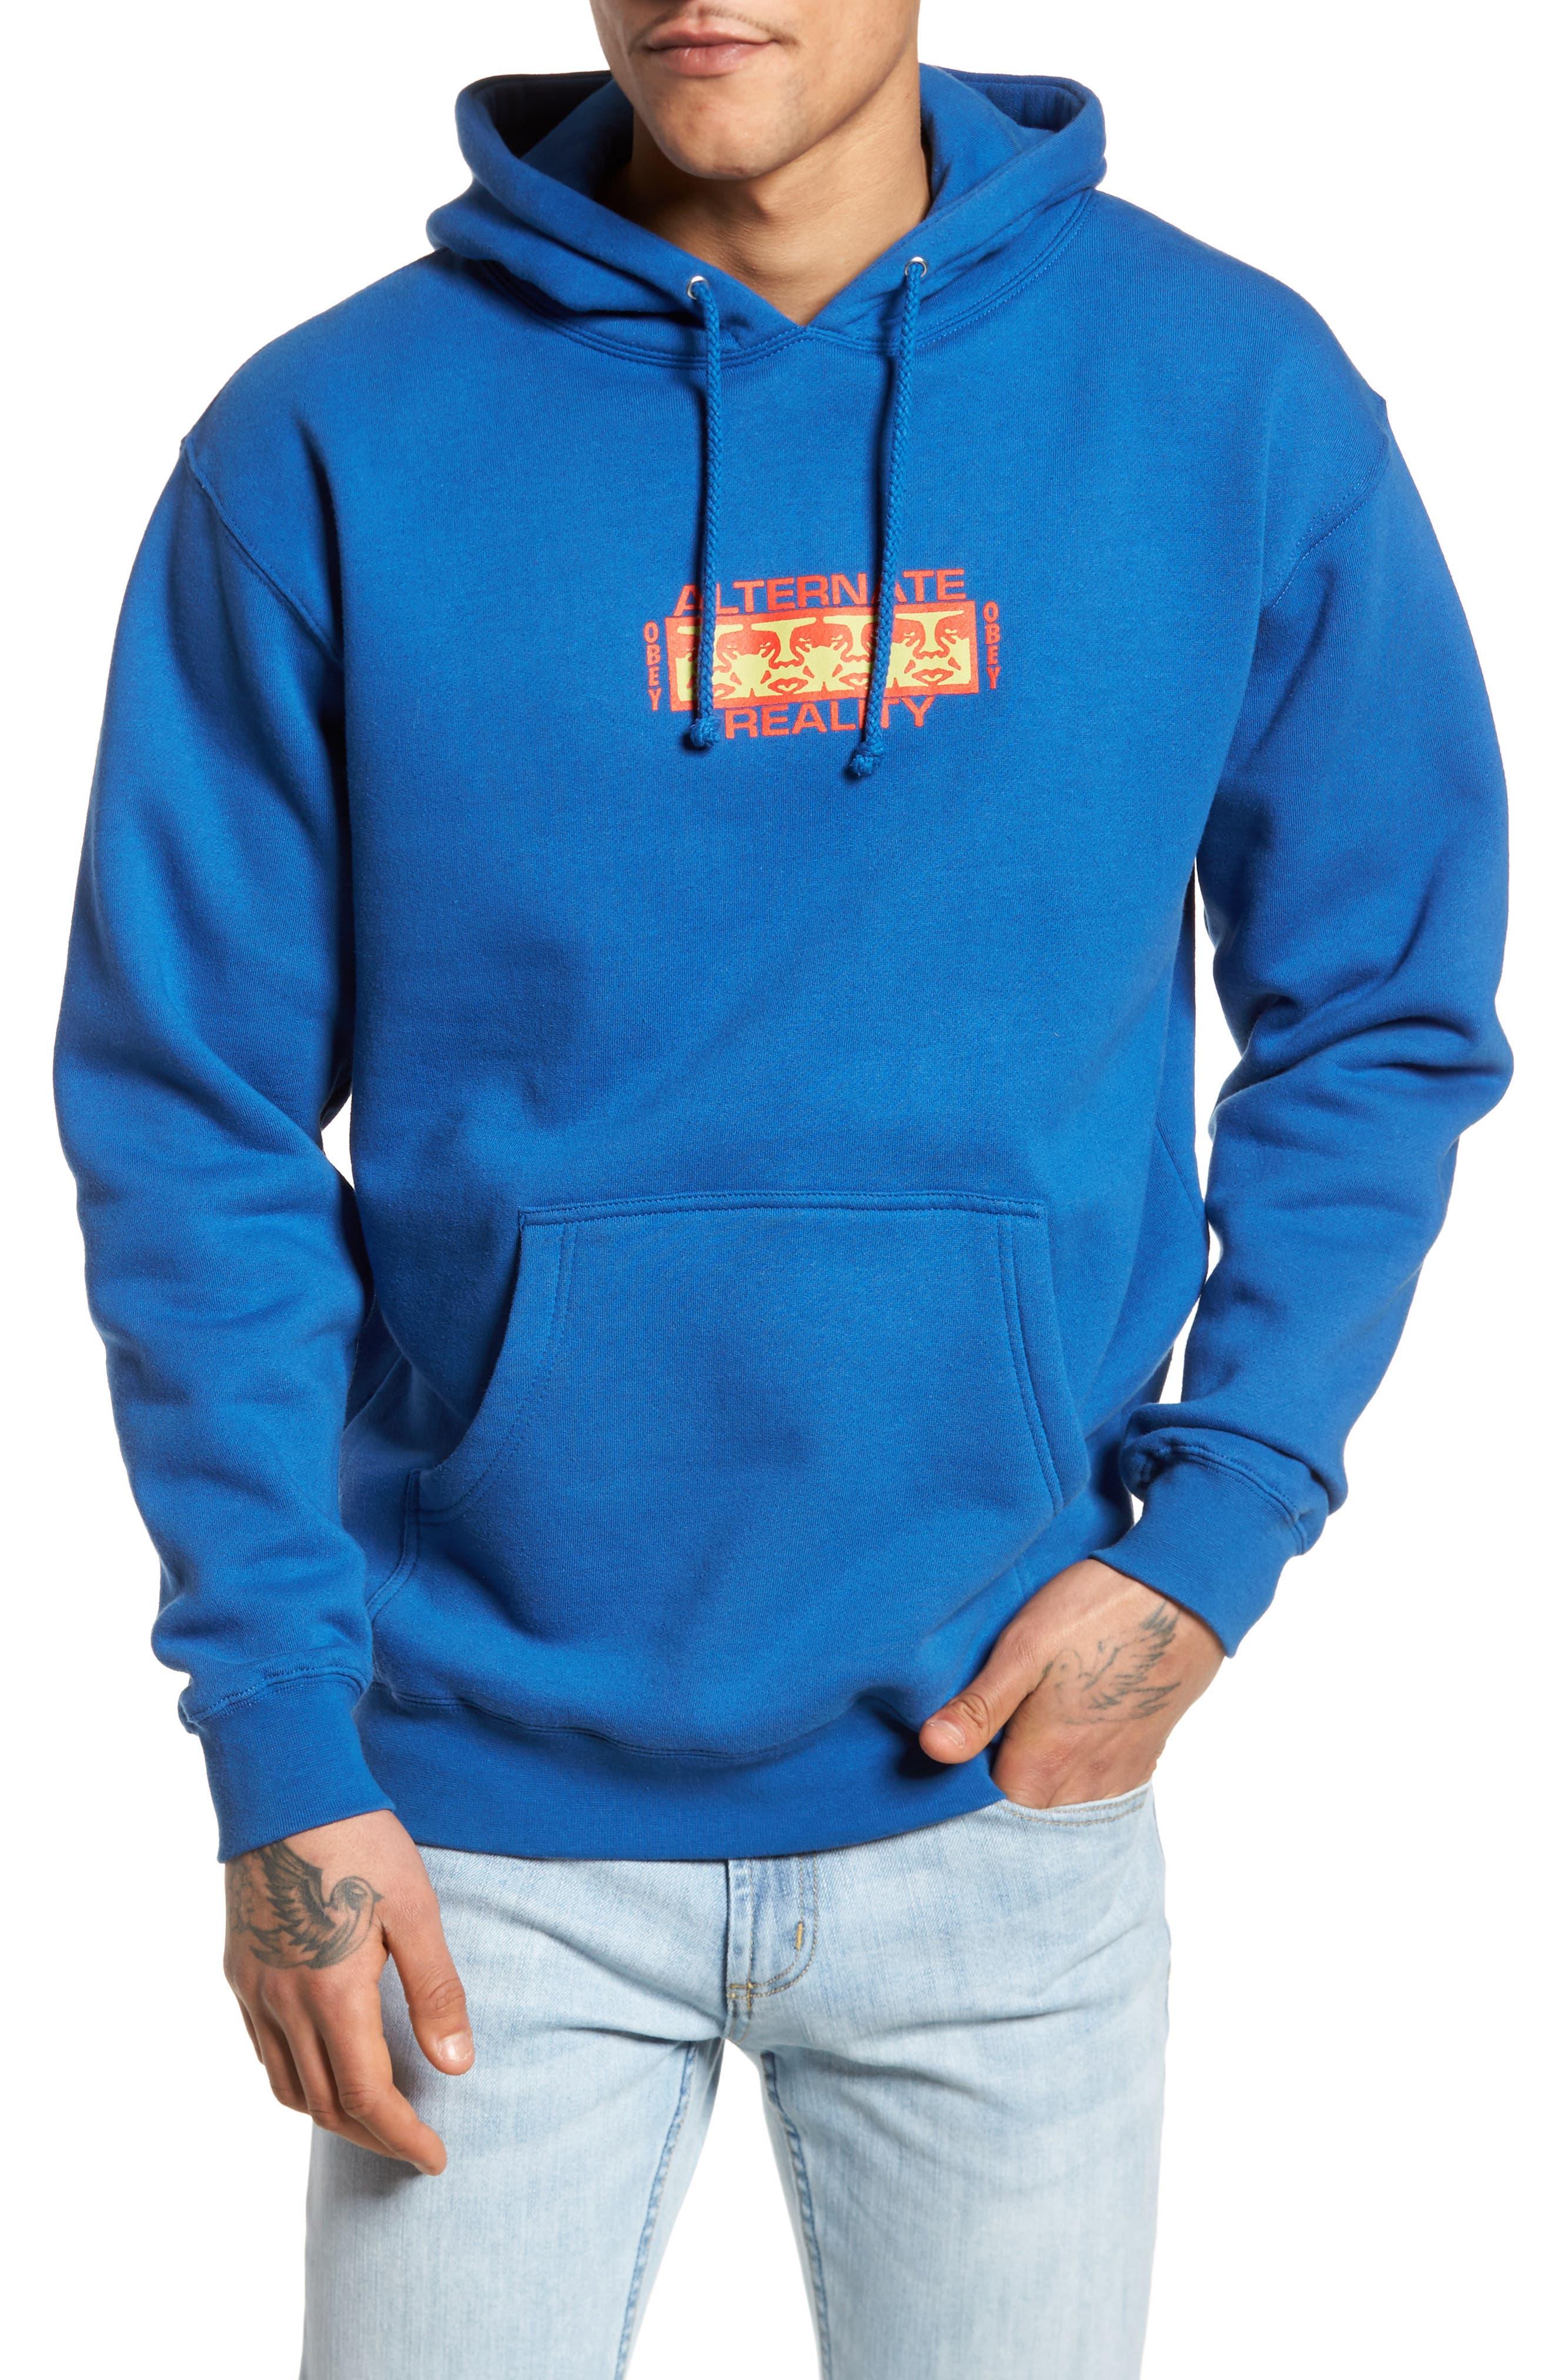 Alternate Reality Hoodie Sweatshirt,                             Main thumbnail 1, color,                             Royal Blue